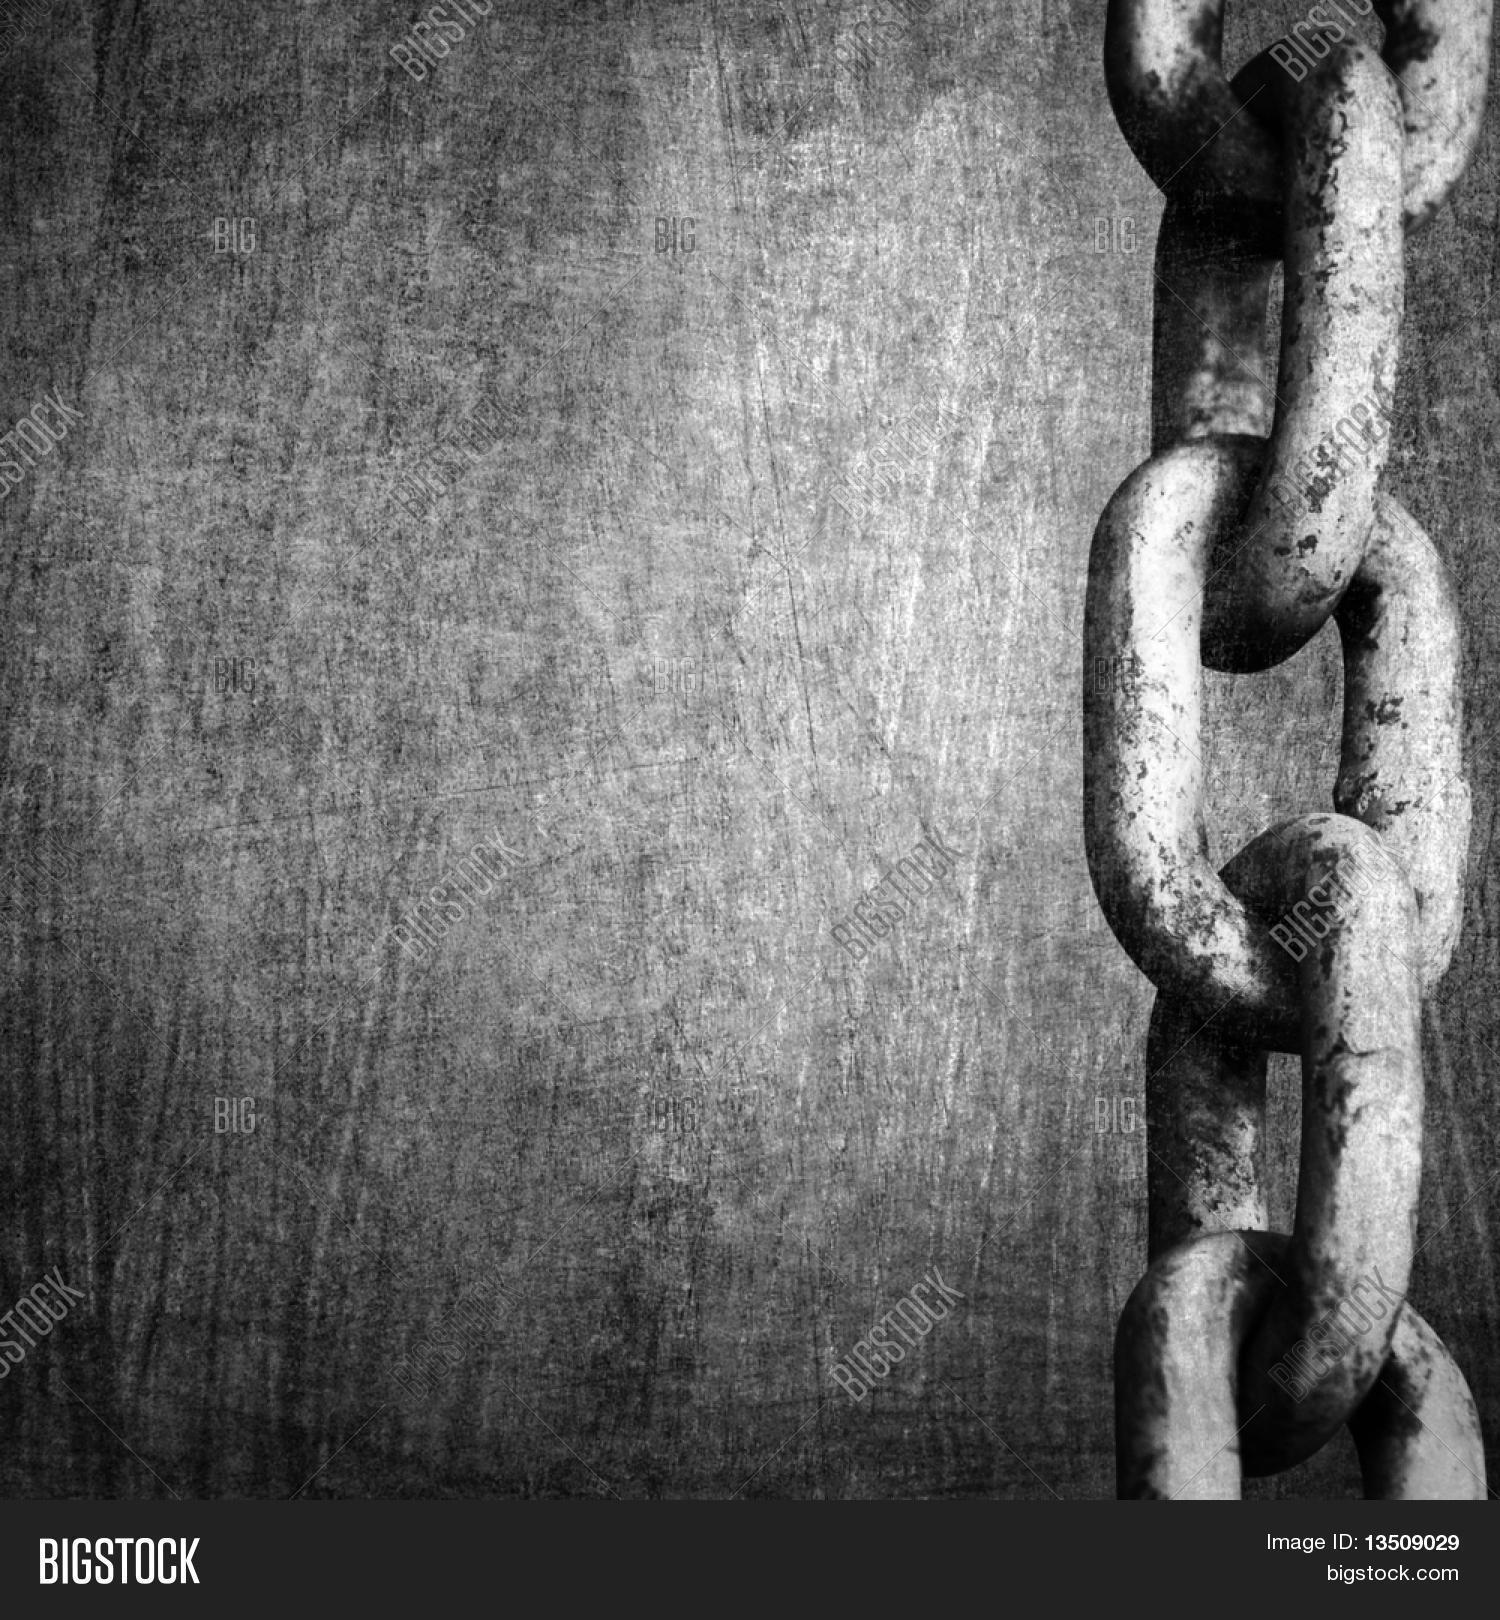 Heavy Chain On Metal Image Photo Free Trial Bigstock